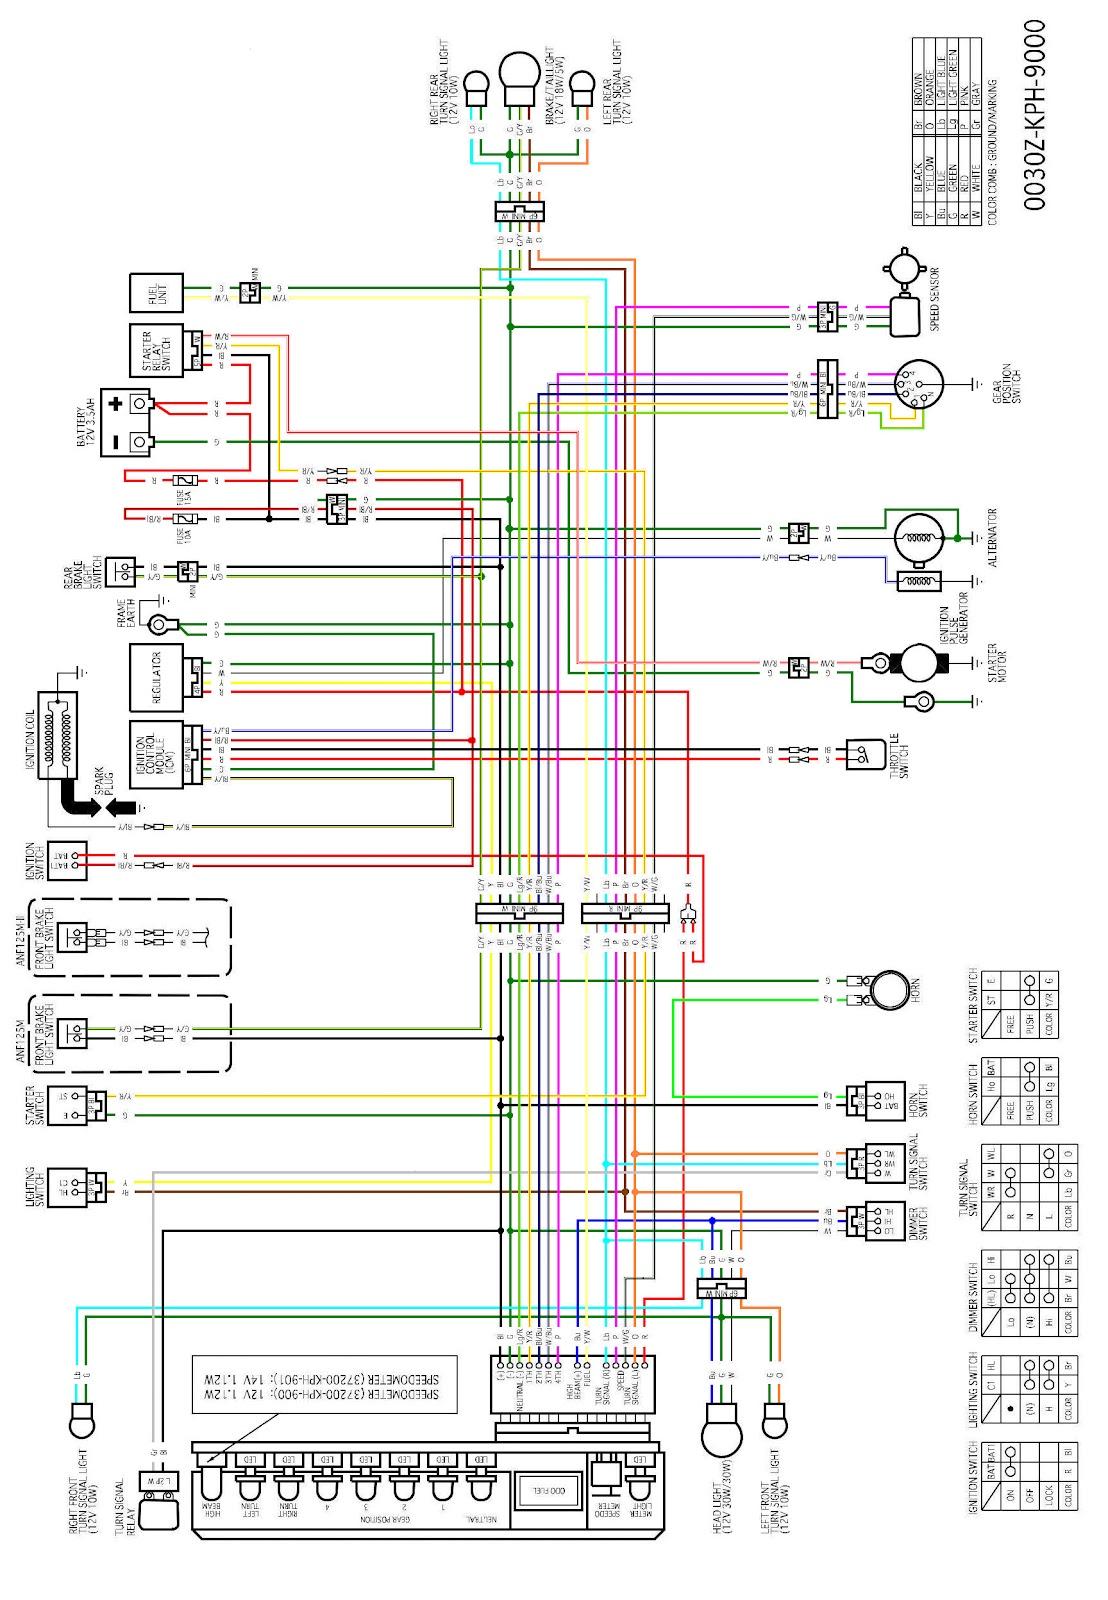 1976 honda cb750f wiring diagram home creator xl350 mr 250